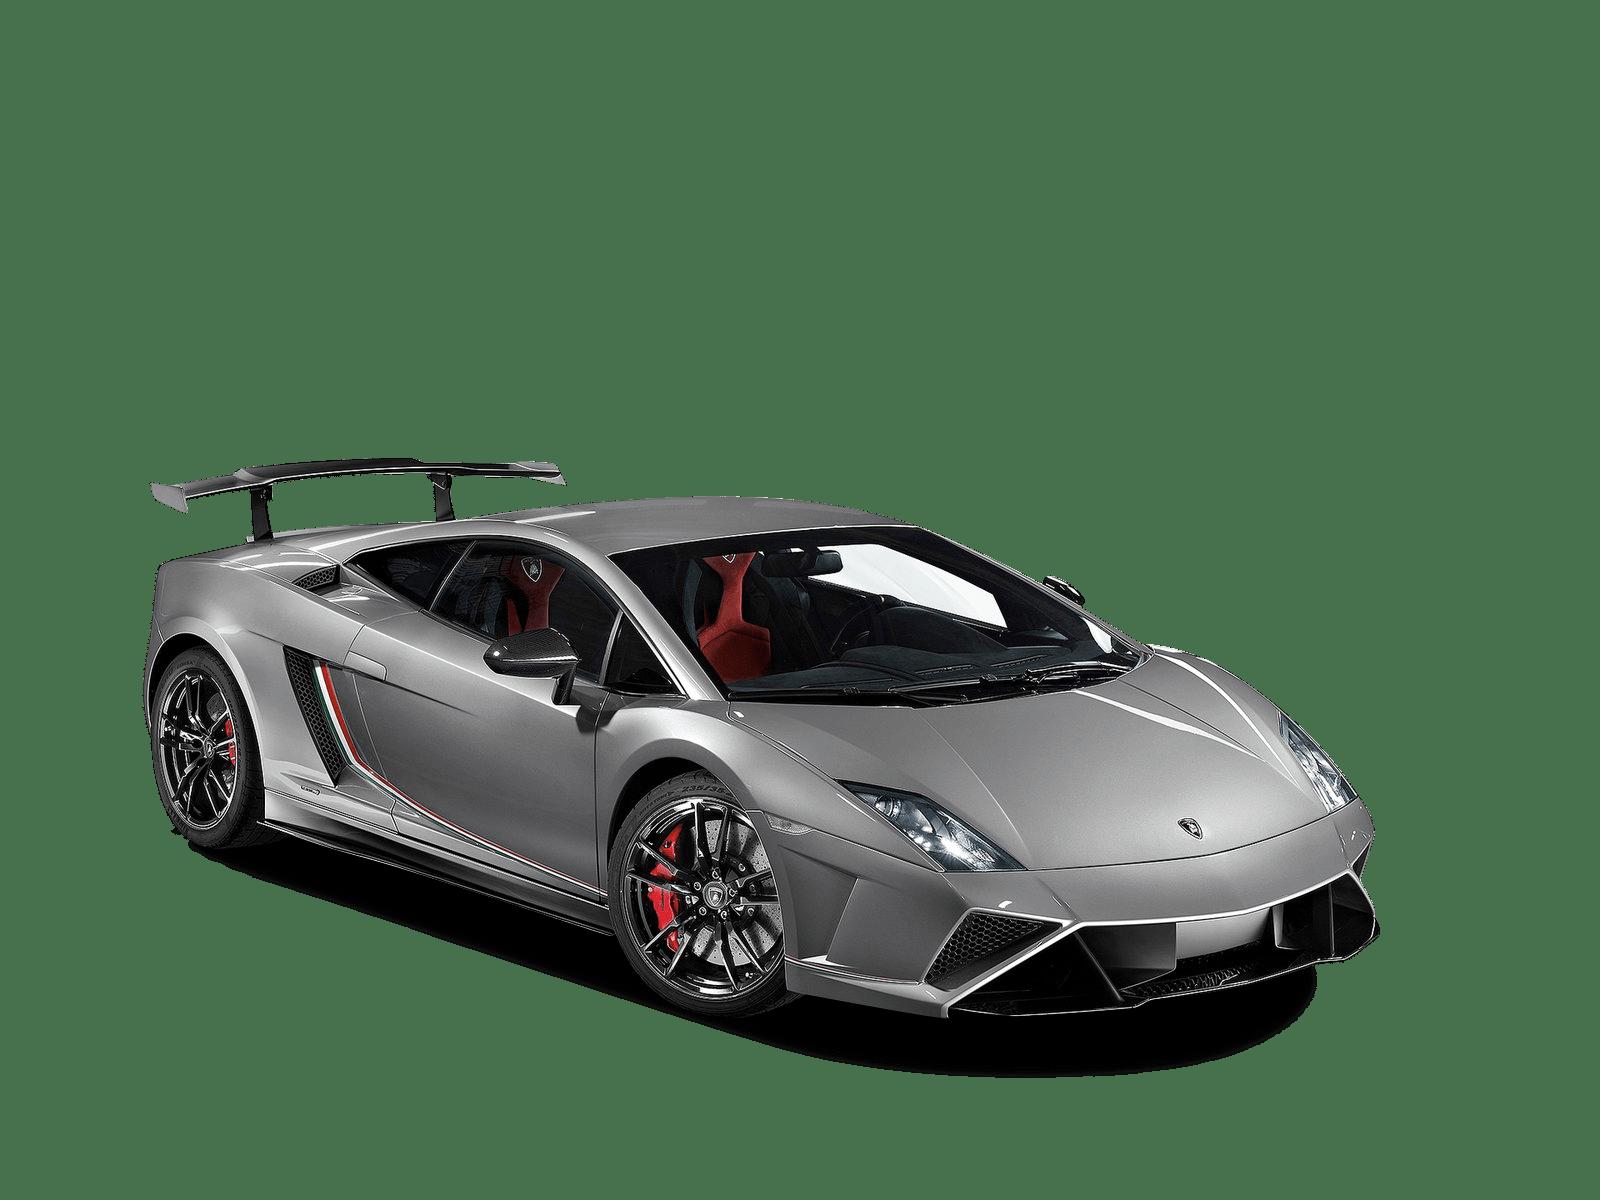 Lamborghini Gallardo Reviews Carsguide